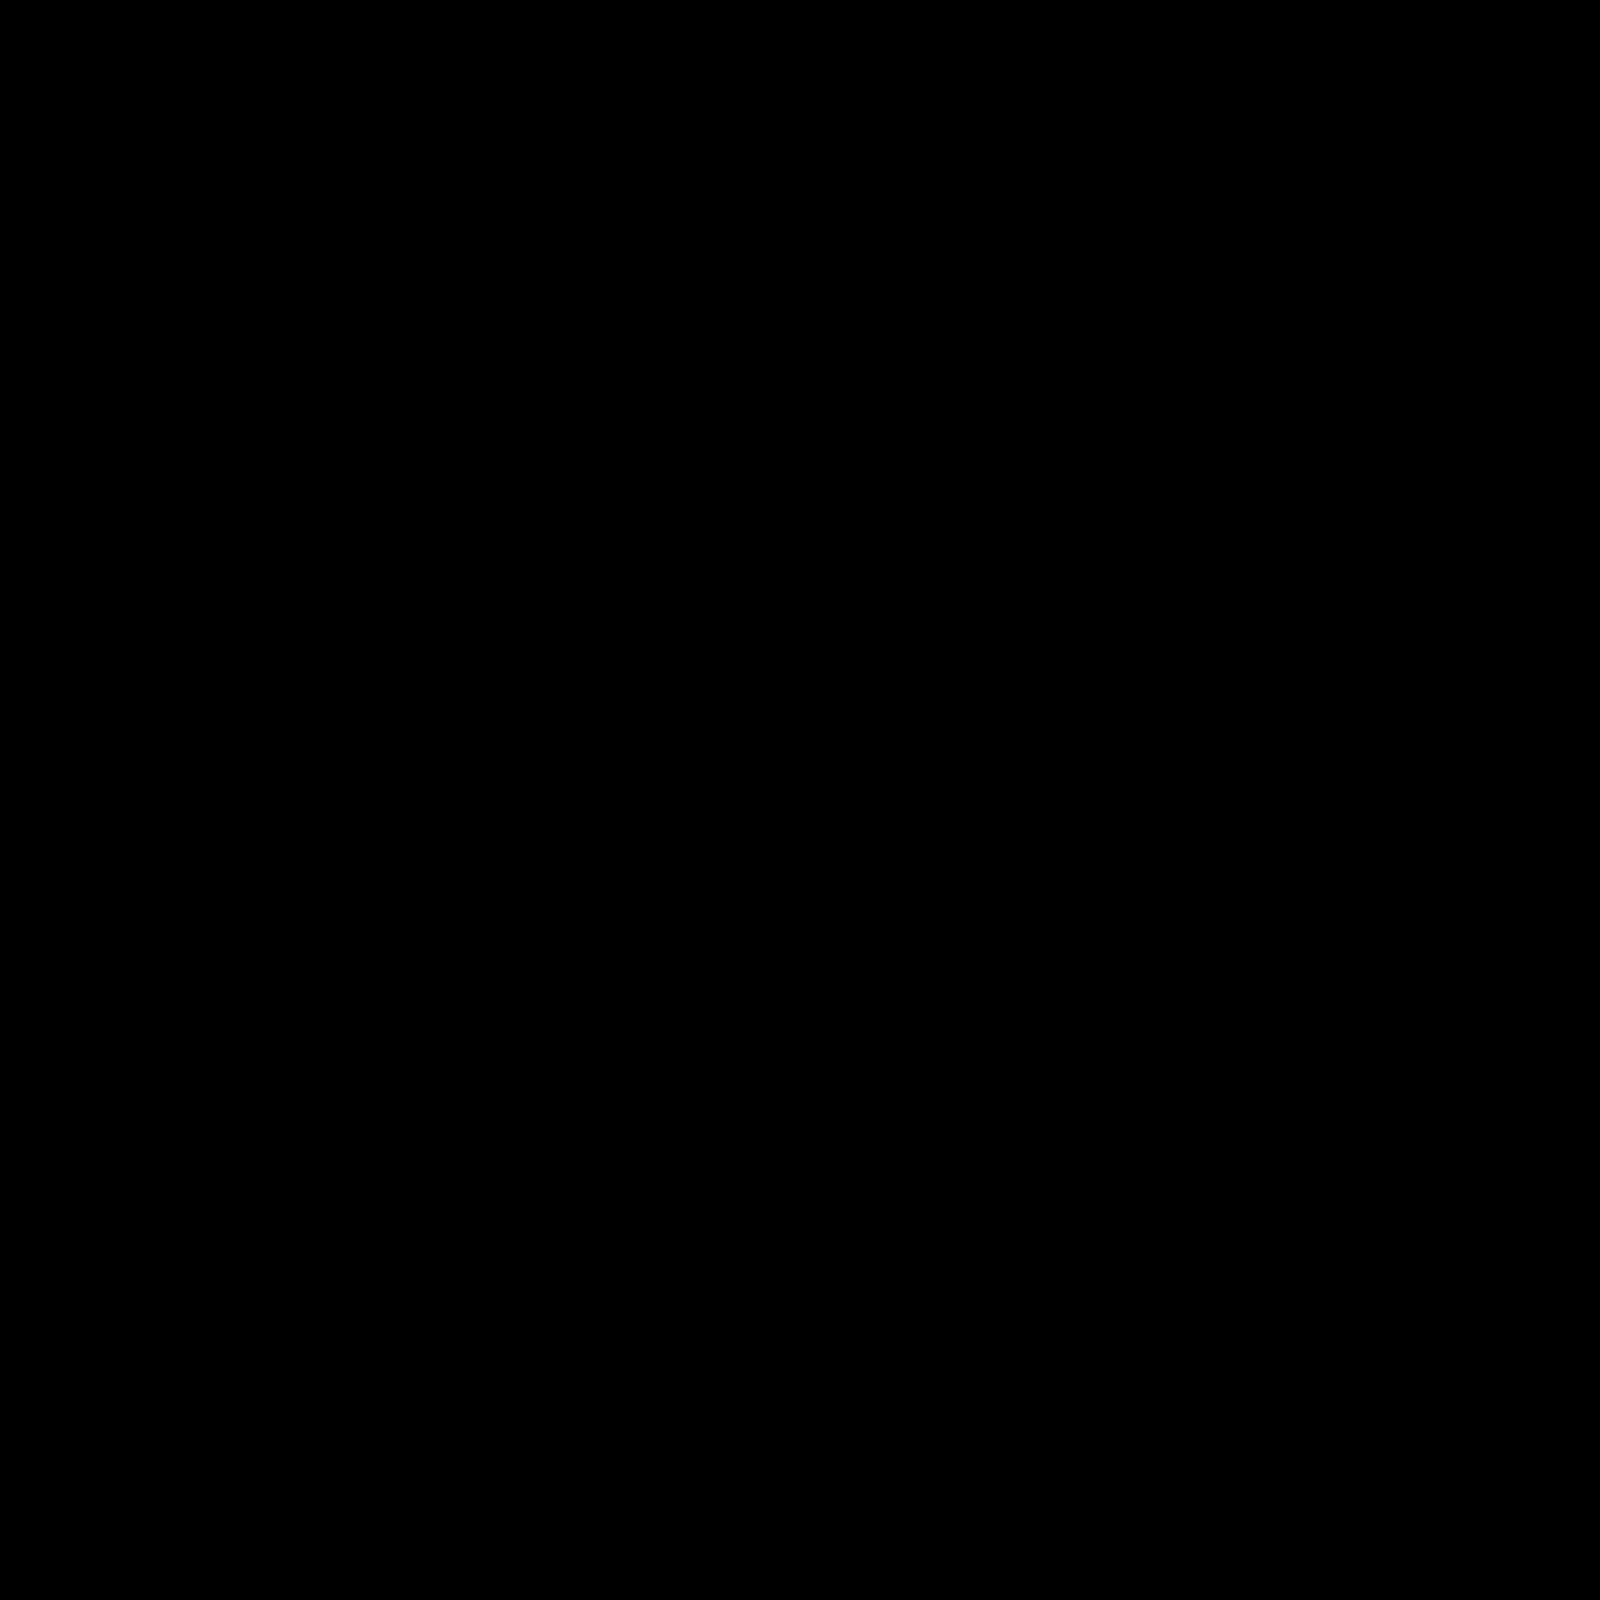 Lounge Music Playlist icon